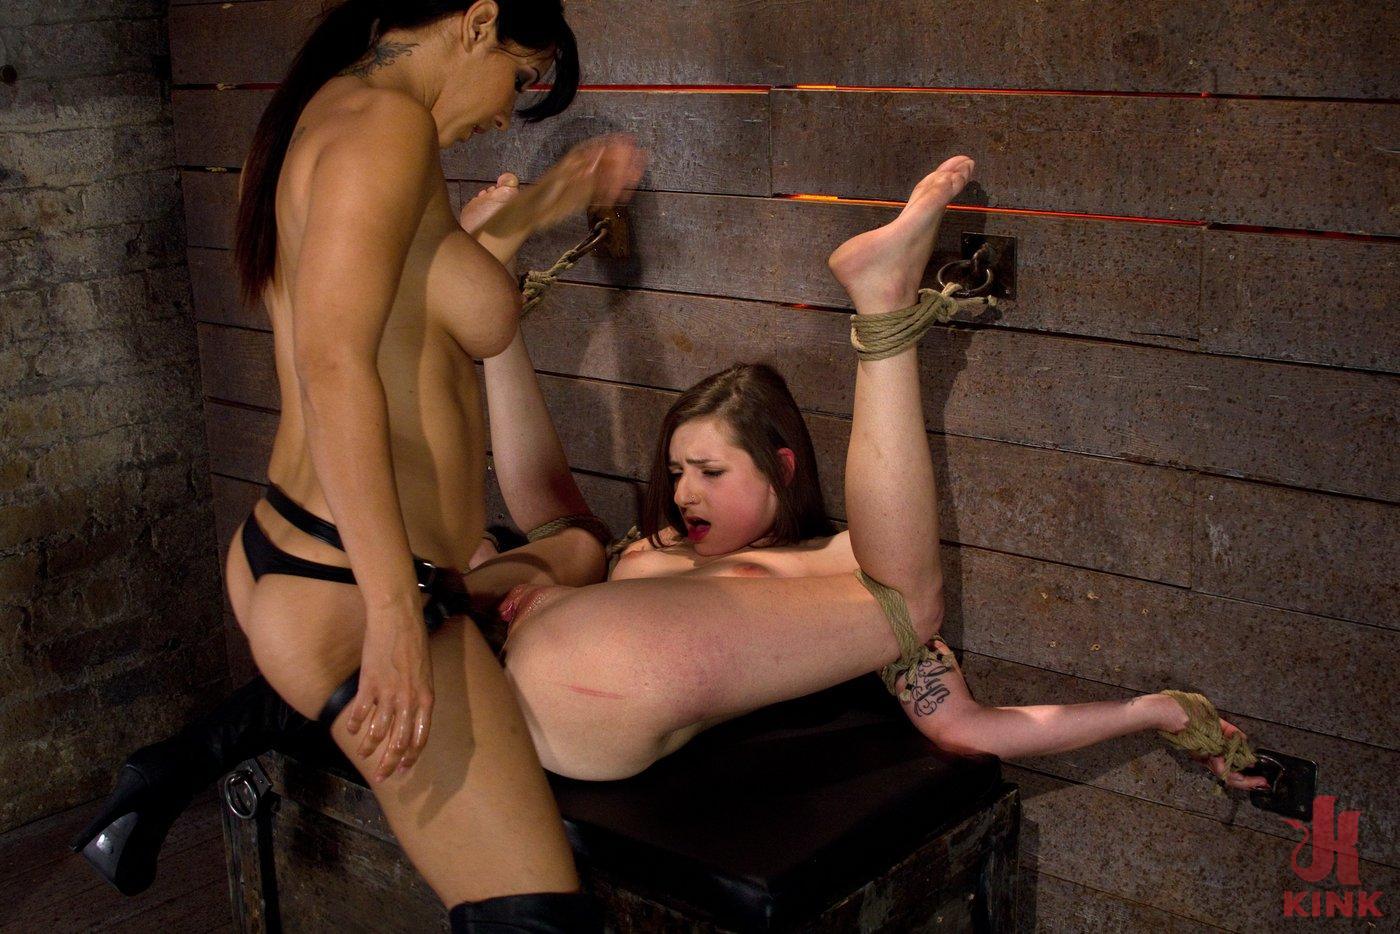 Порно рабыня фото онлайн